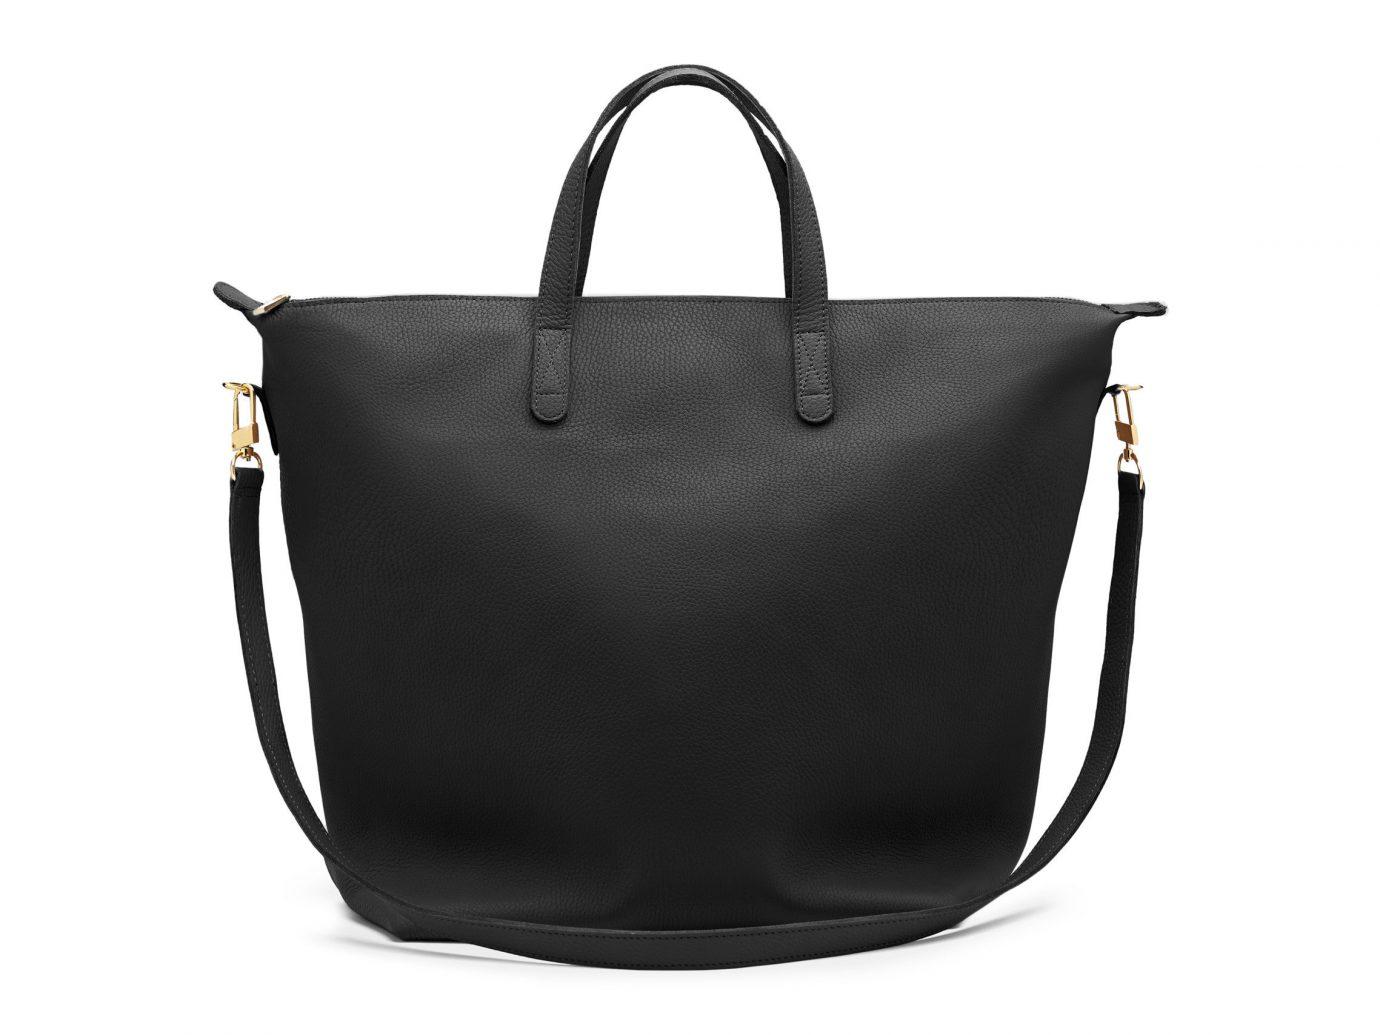 Style + Design bag black handbag accessory fashion accessory indoor leather shoulder bag product tote bag product design brand luggage & bags baggage case